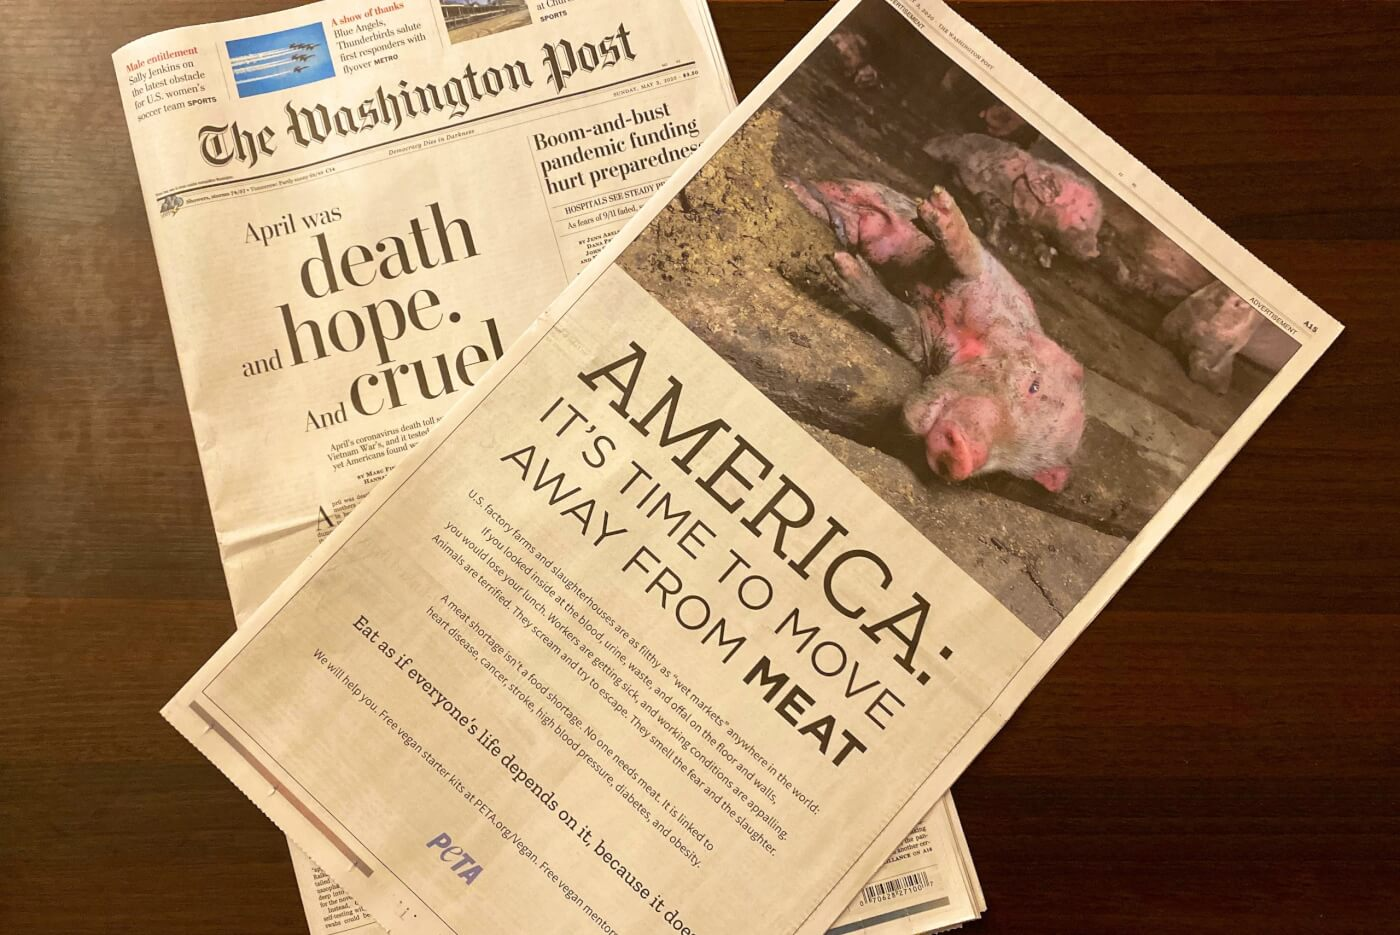 Washington Post PETA ad